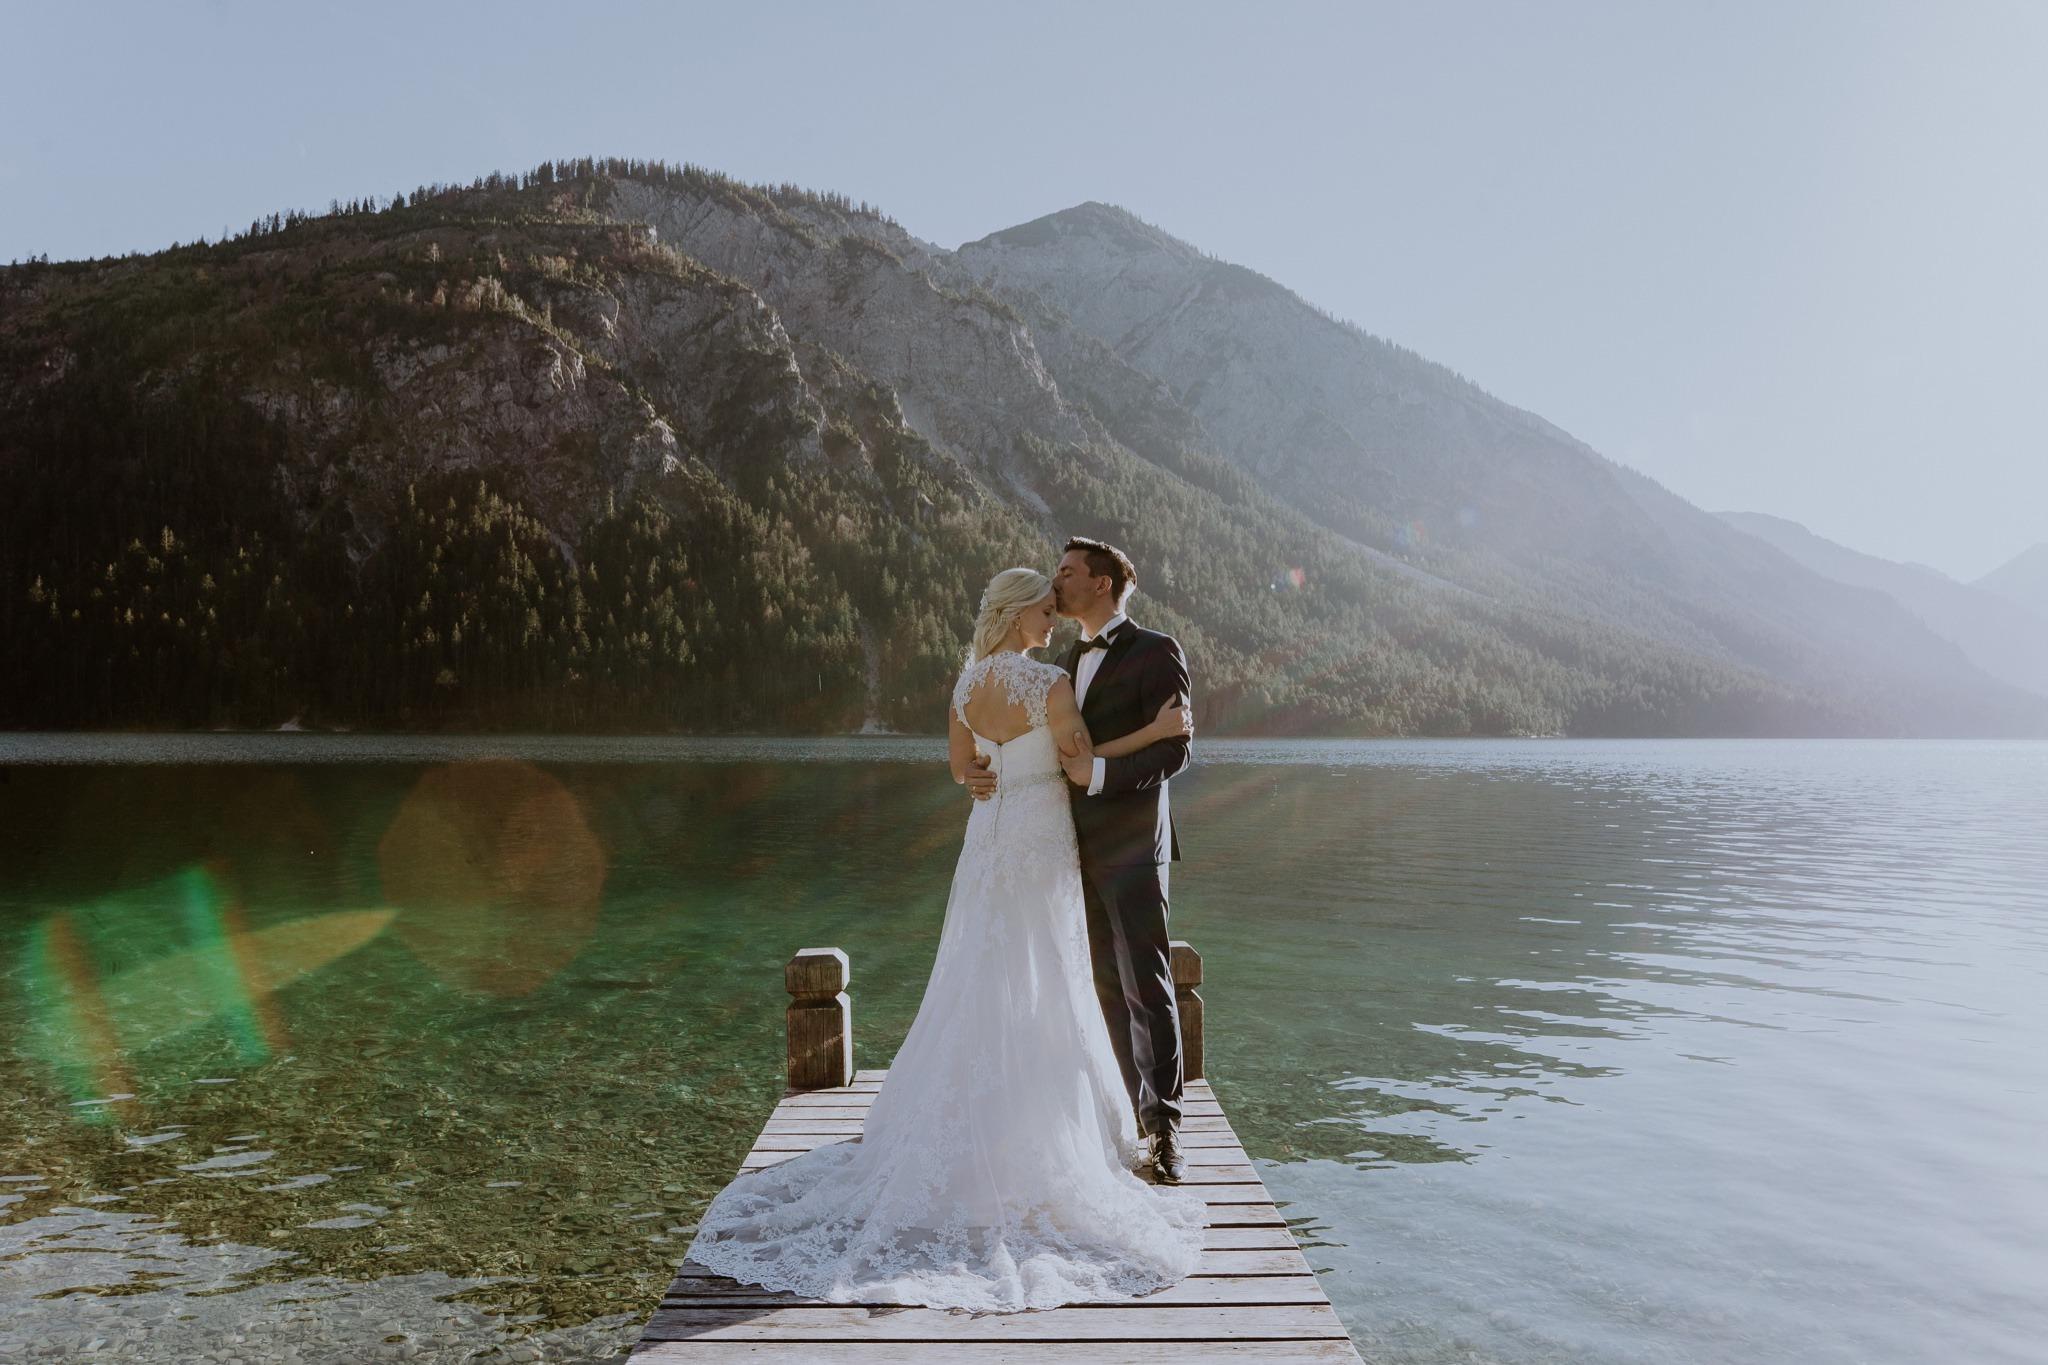 wedding photographer hamilton new zealand 13